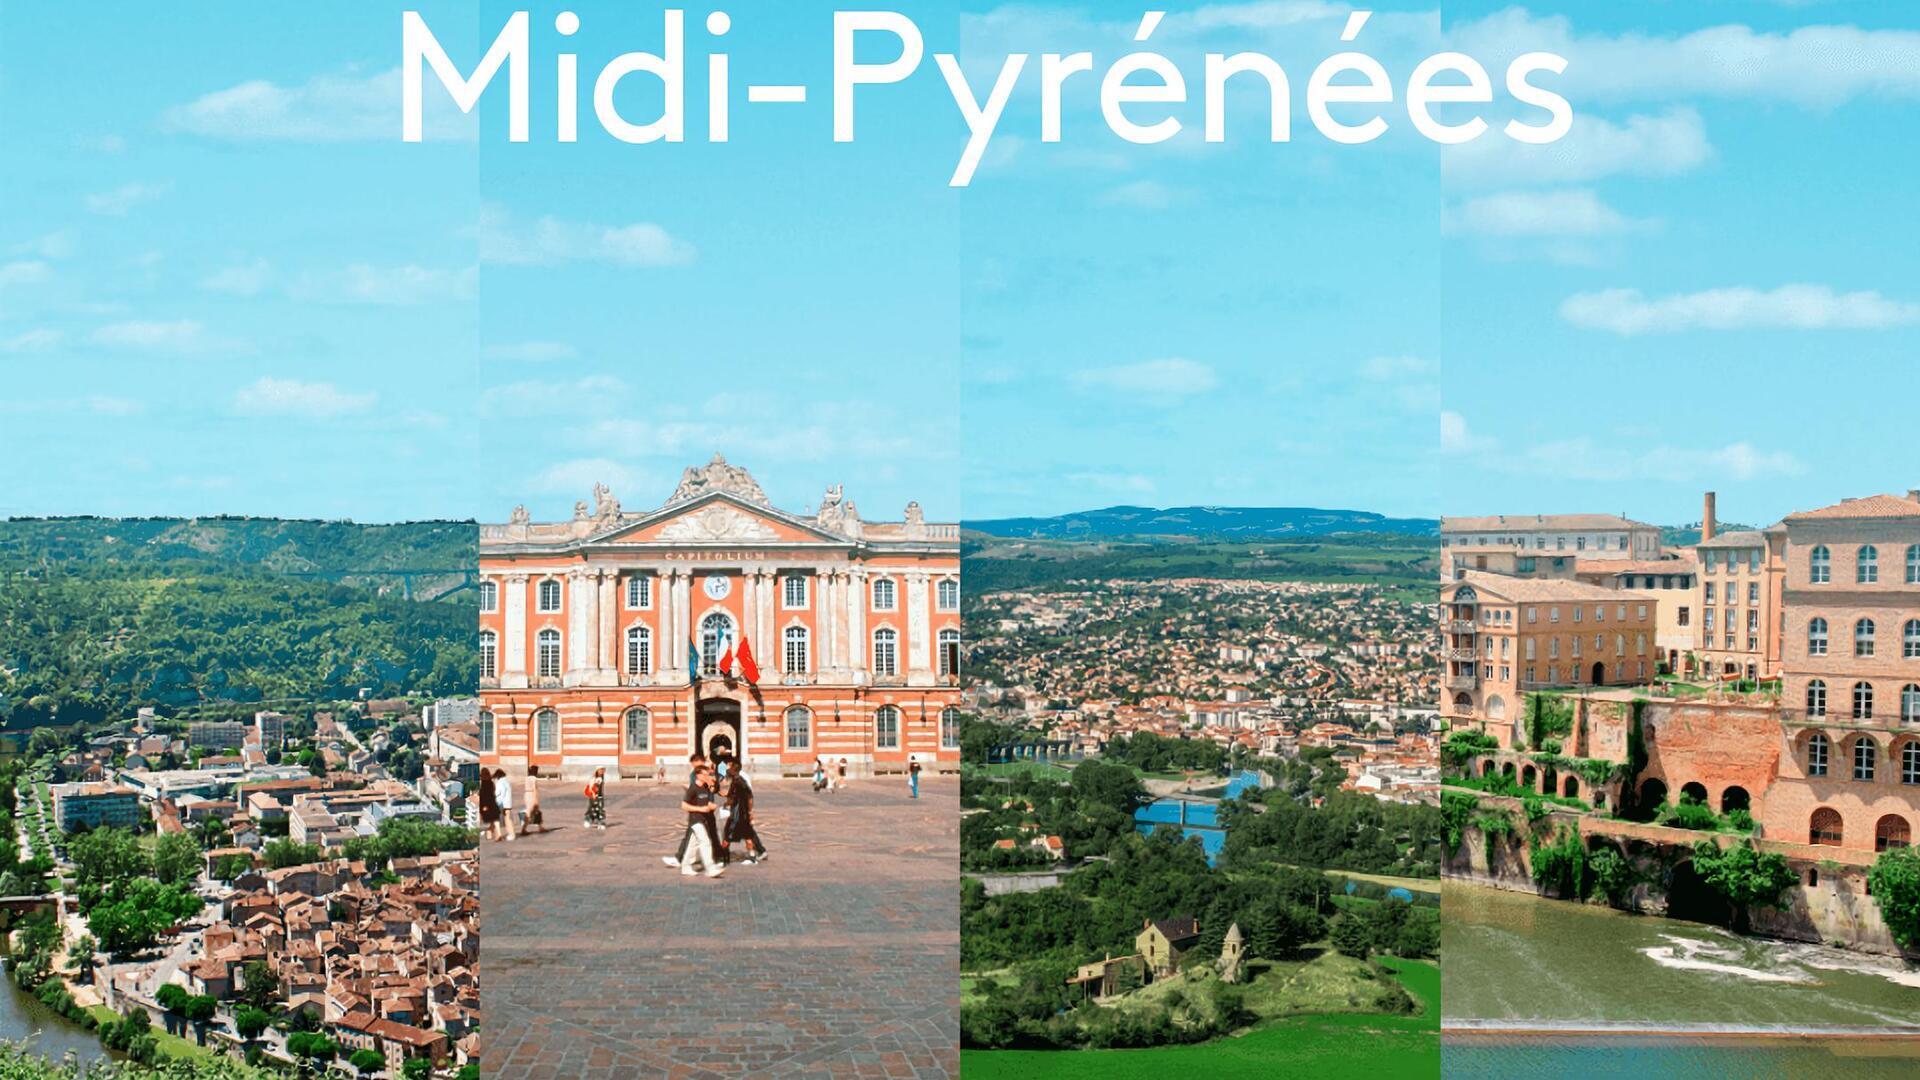 12/13 Midi-Pyrénées